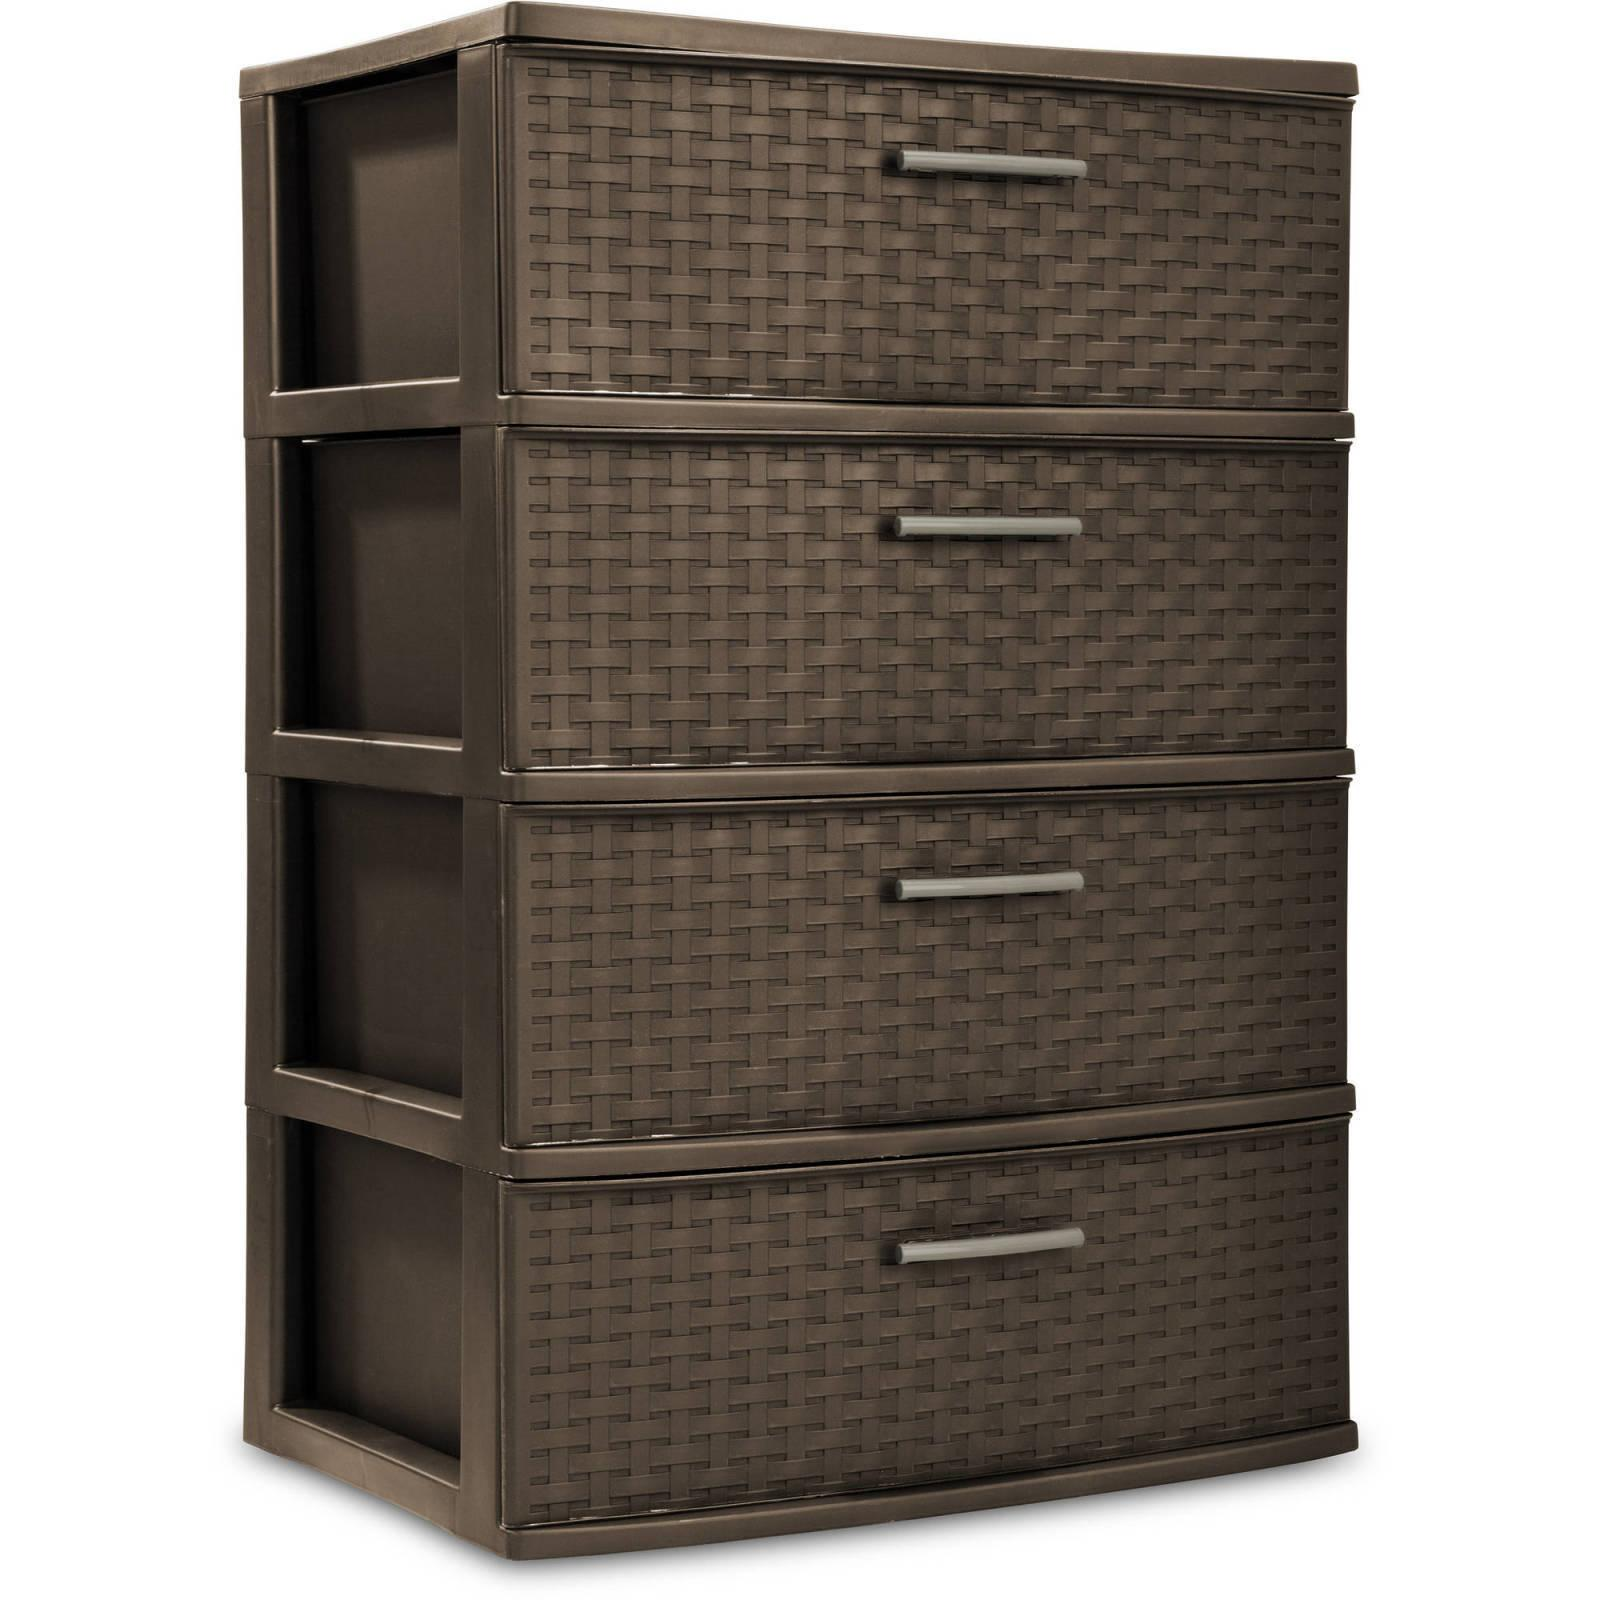 4 Storage Set Of Plastic Espresso